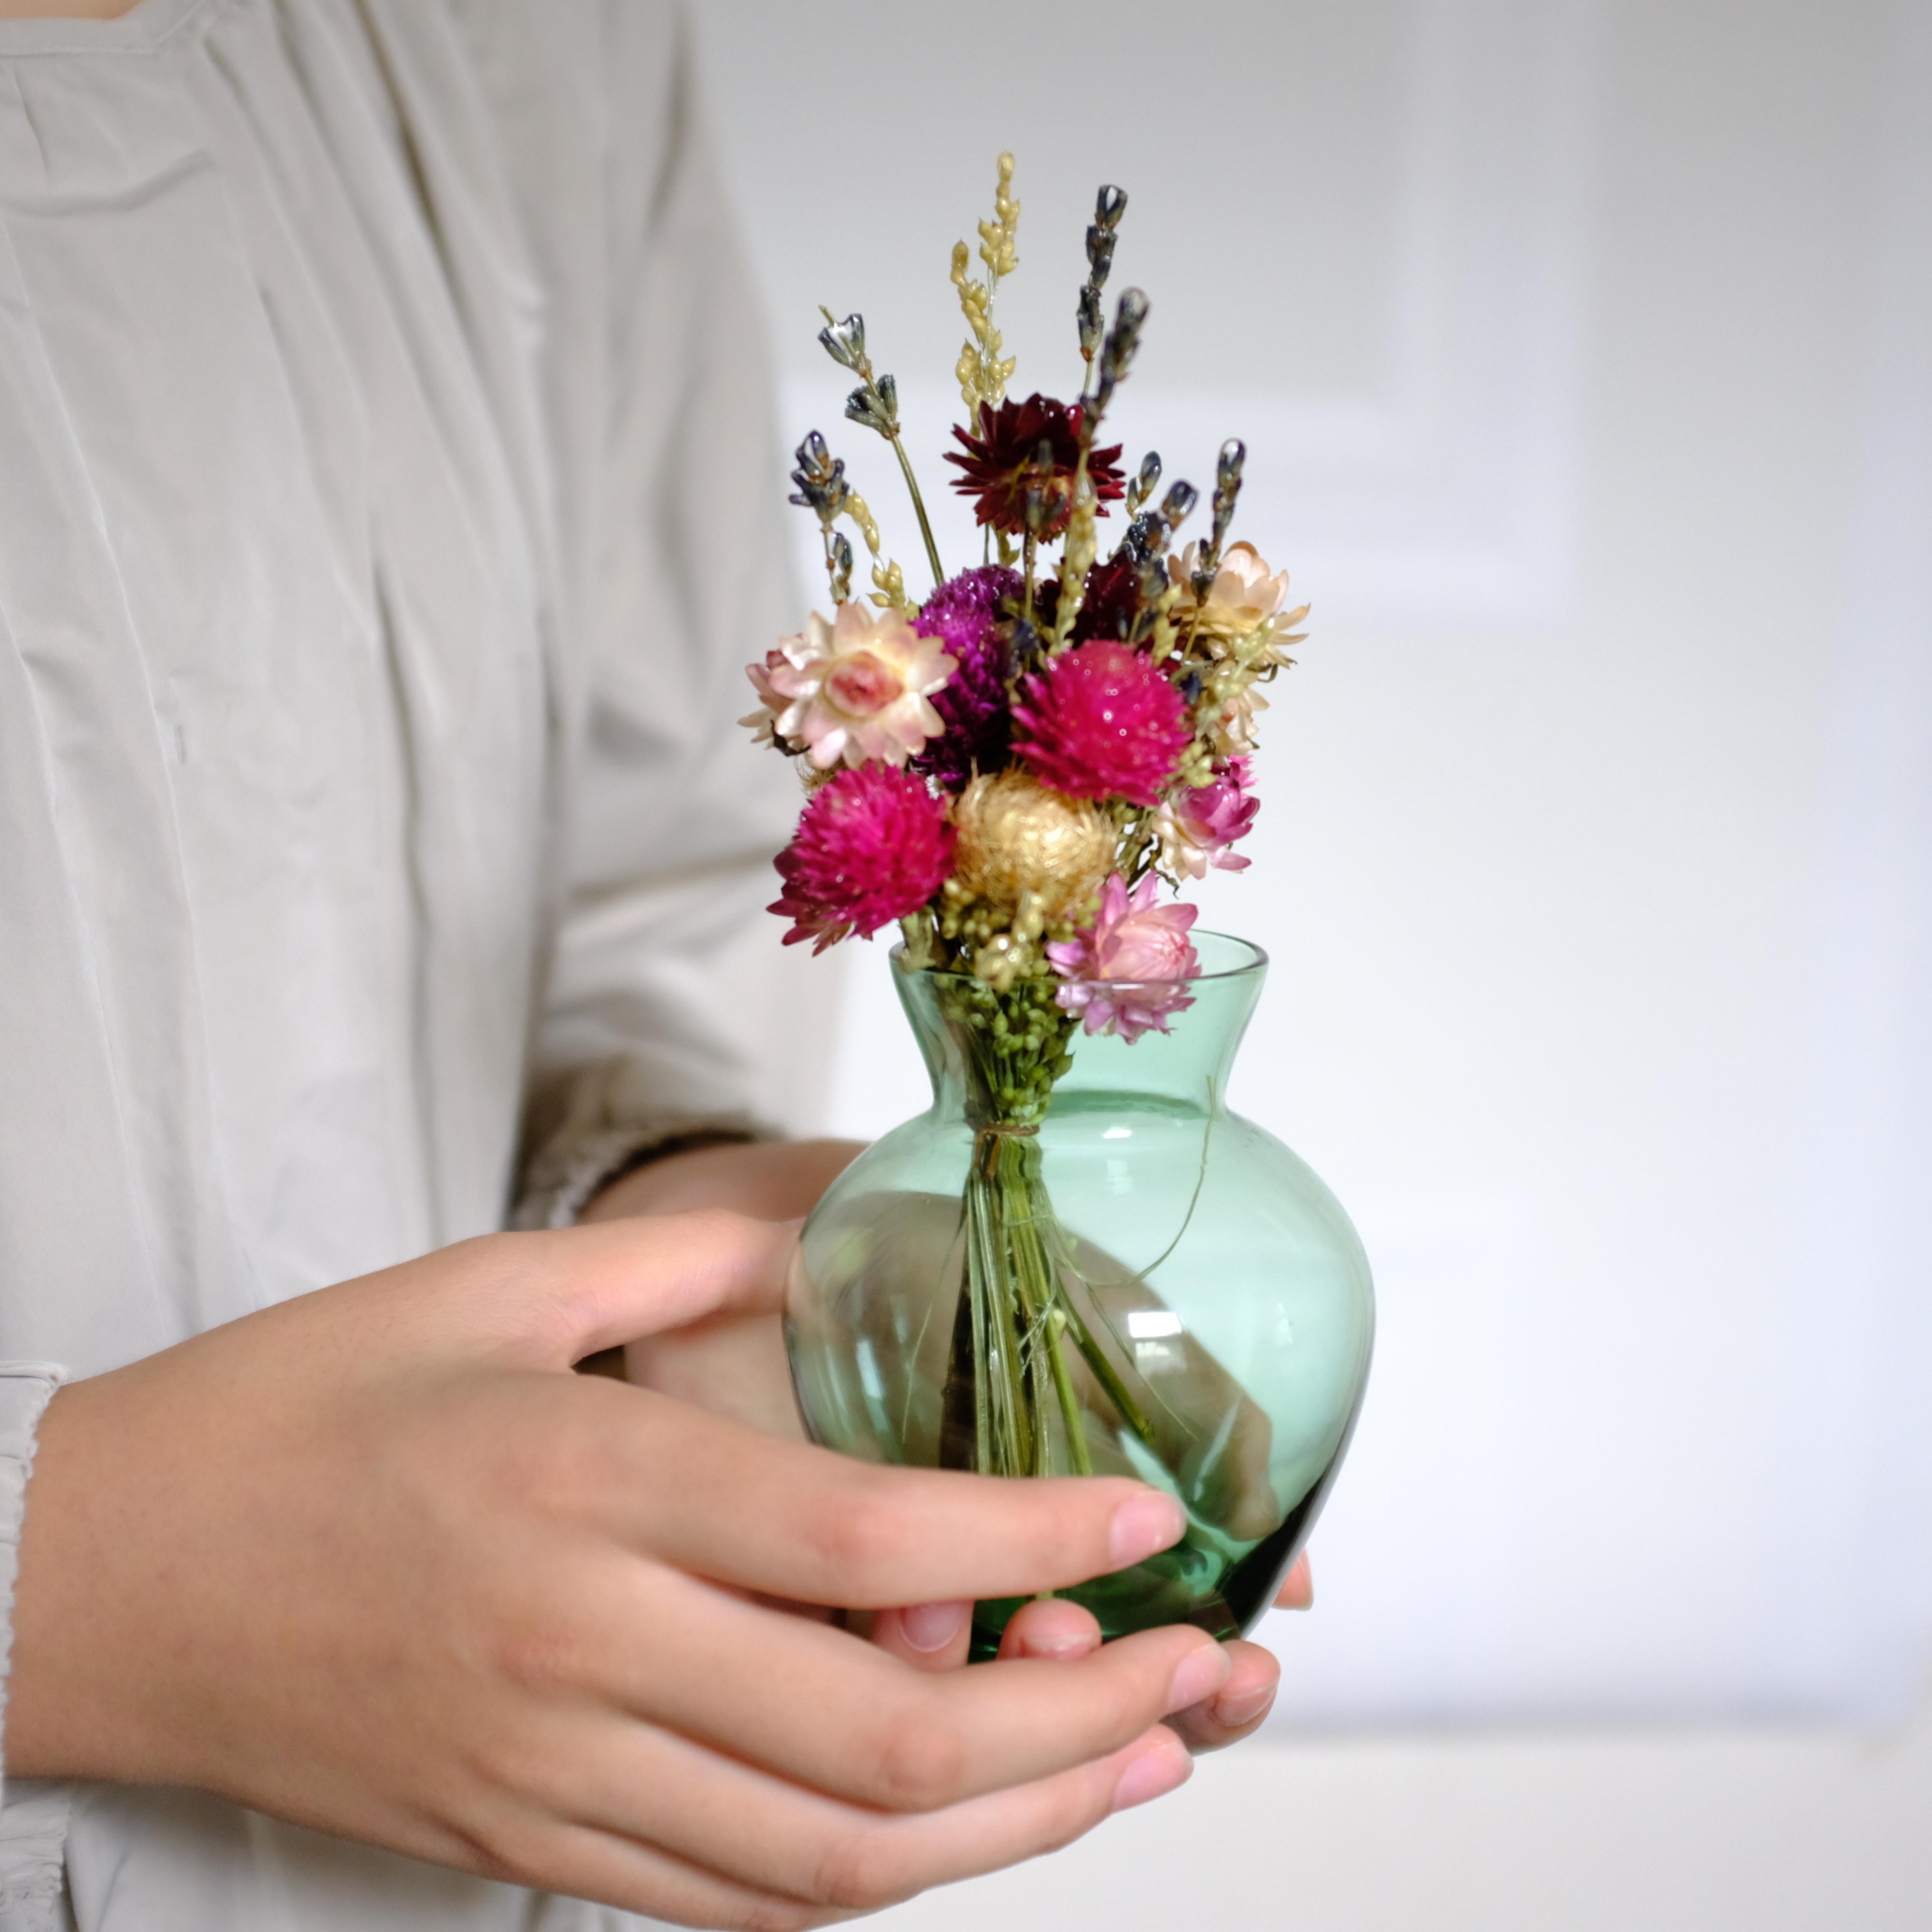 tsuyabana dried flower 花束 3